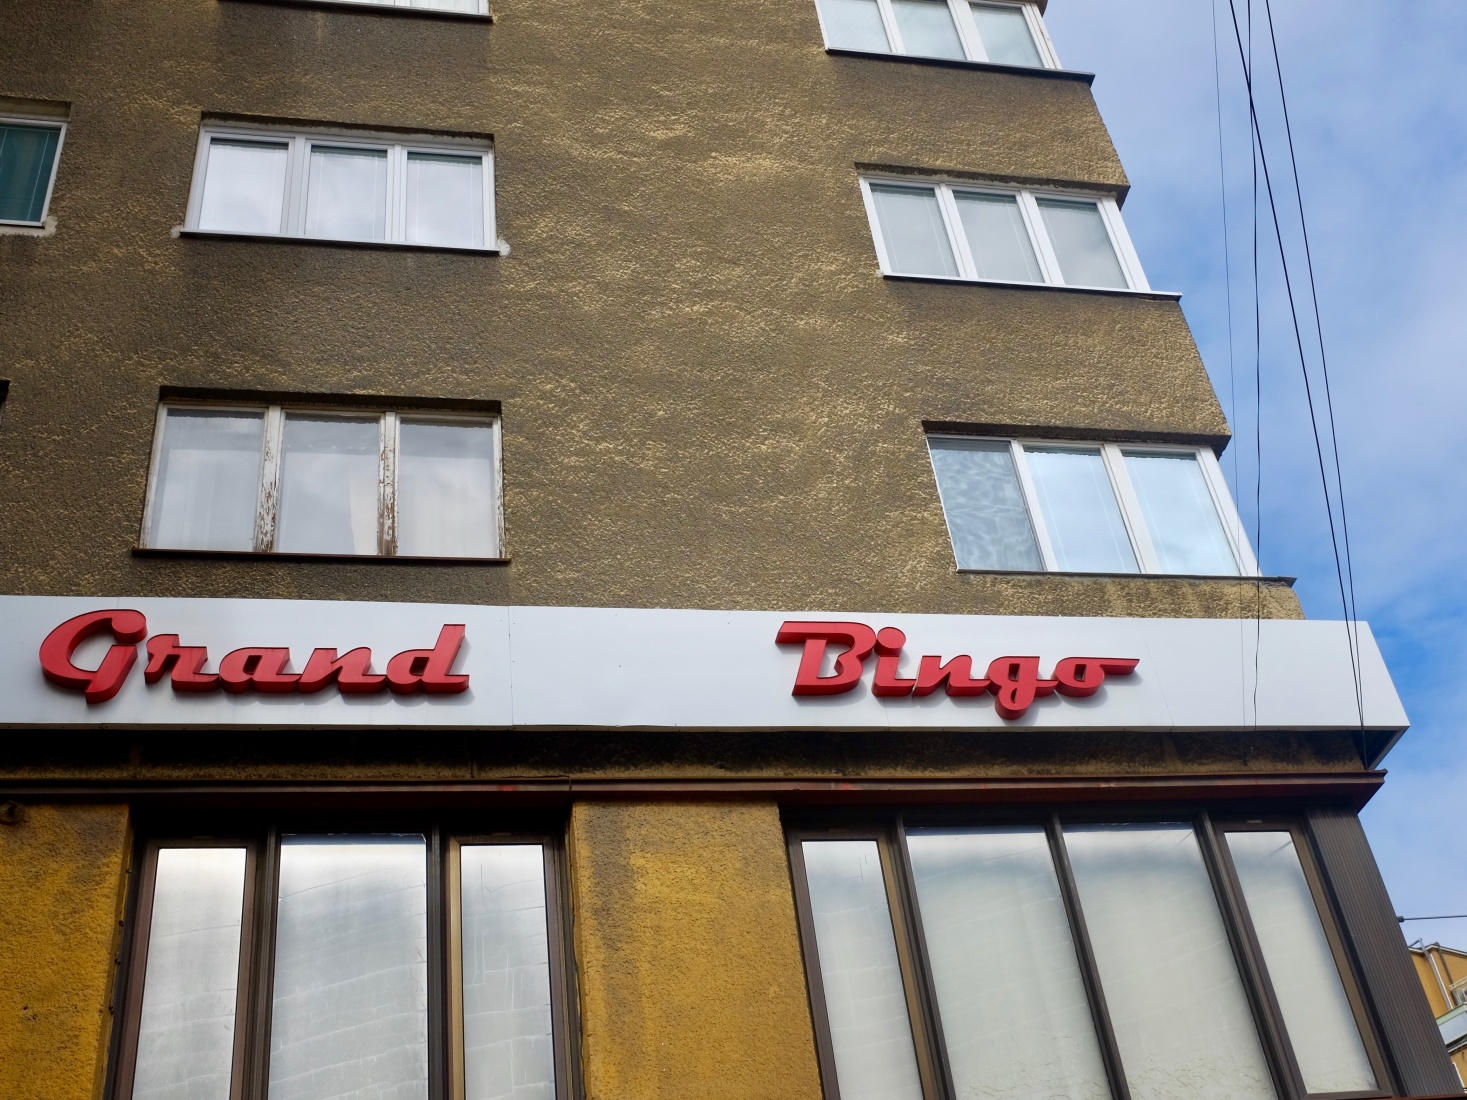 Communist-era architecture in Bratislava, Slovakia.